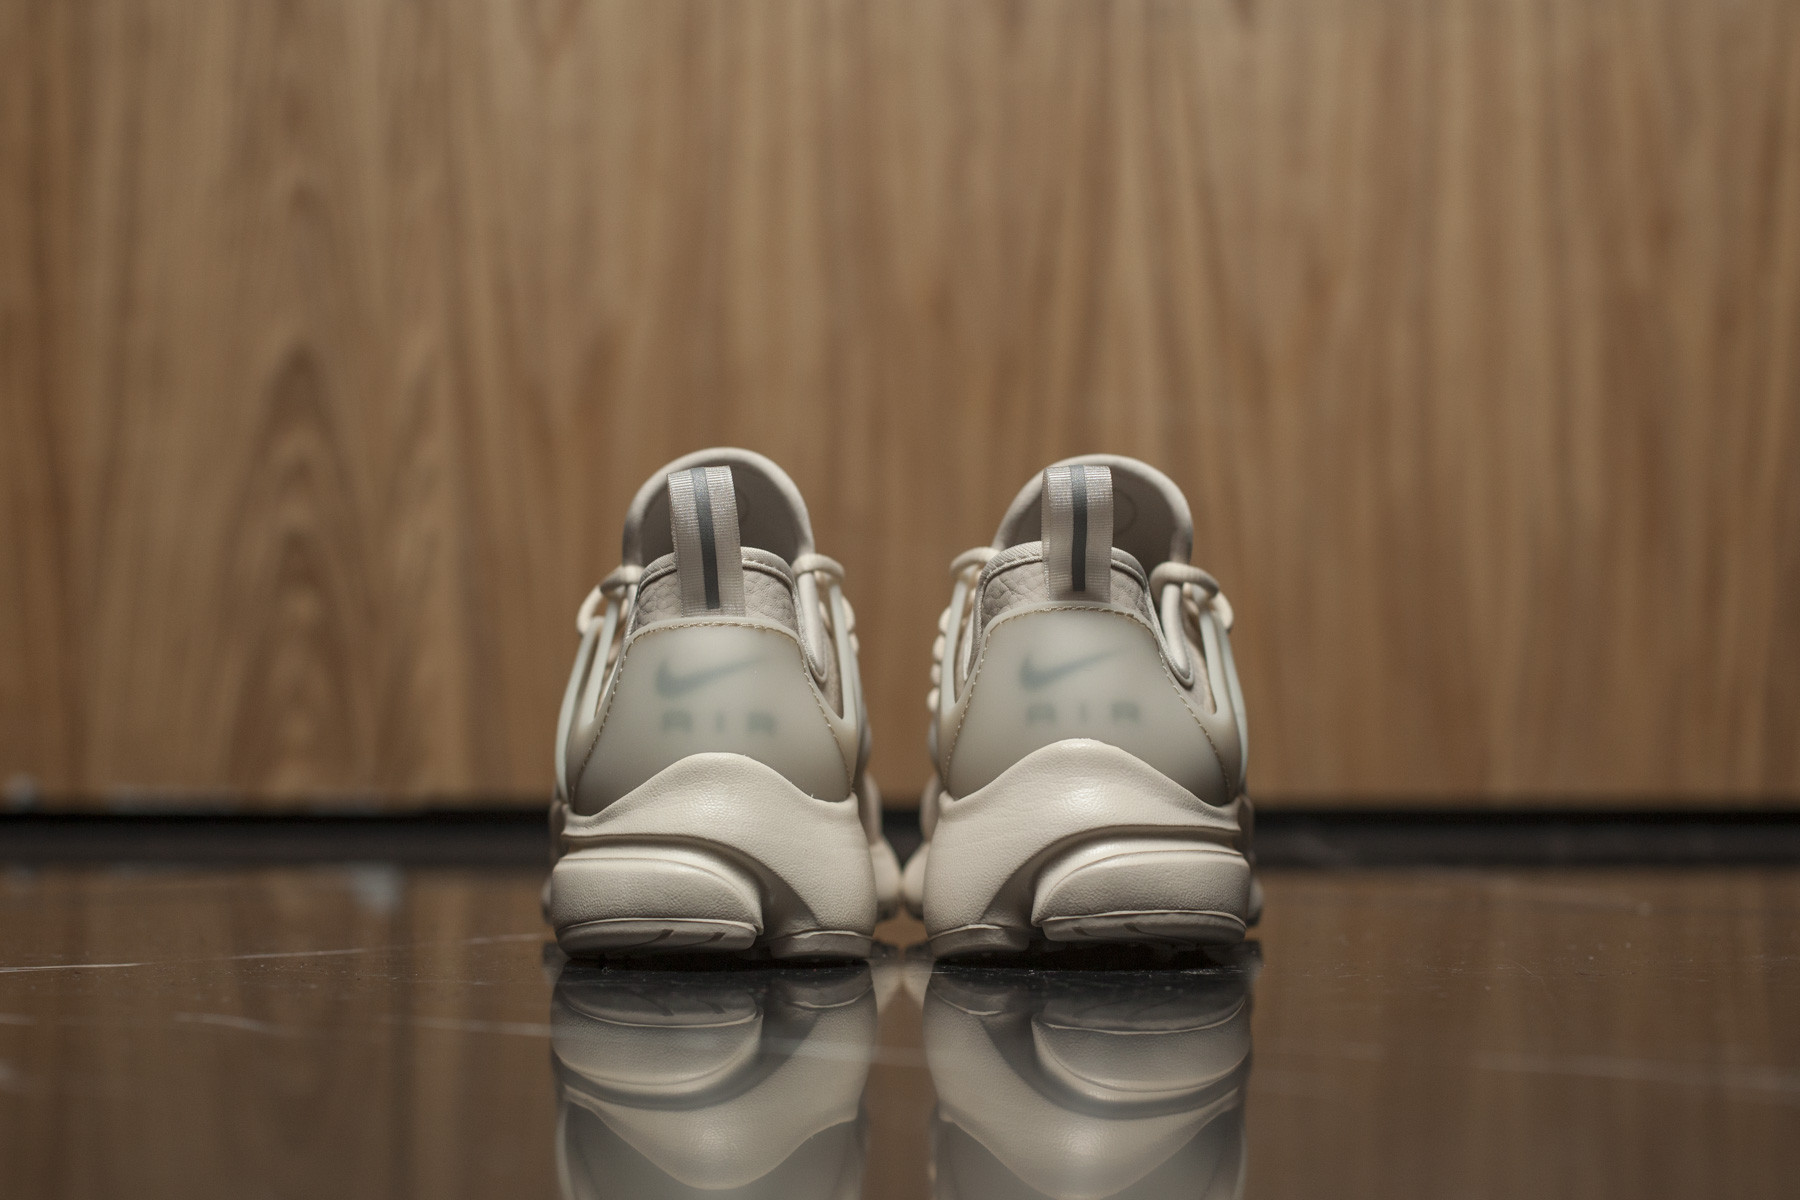 Nike WMNS Air Presto Premium